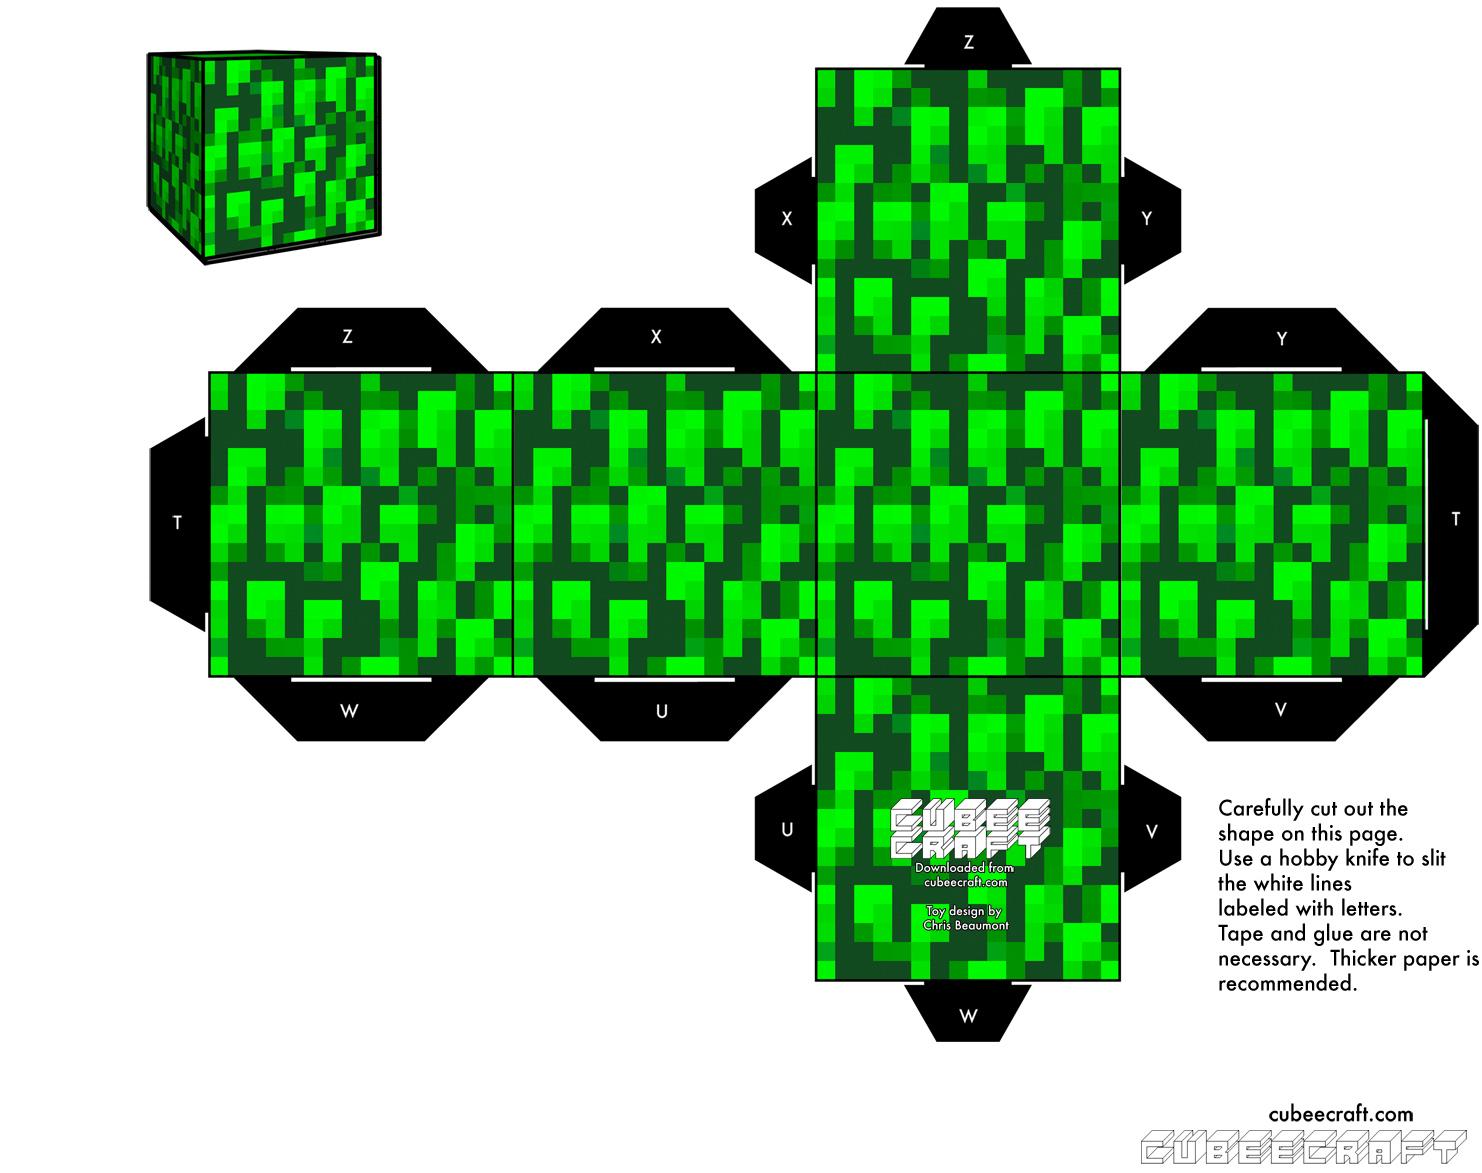 Cubeblog Papercraft 02